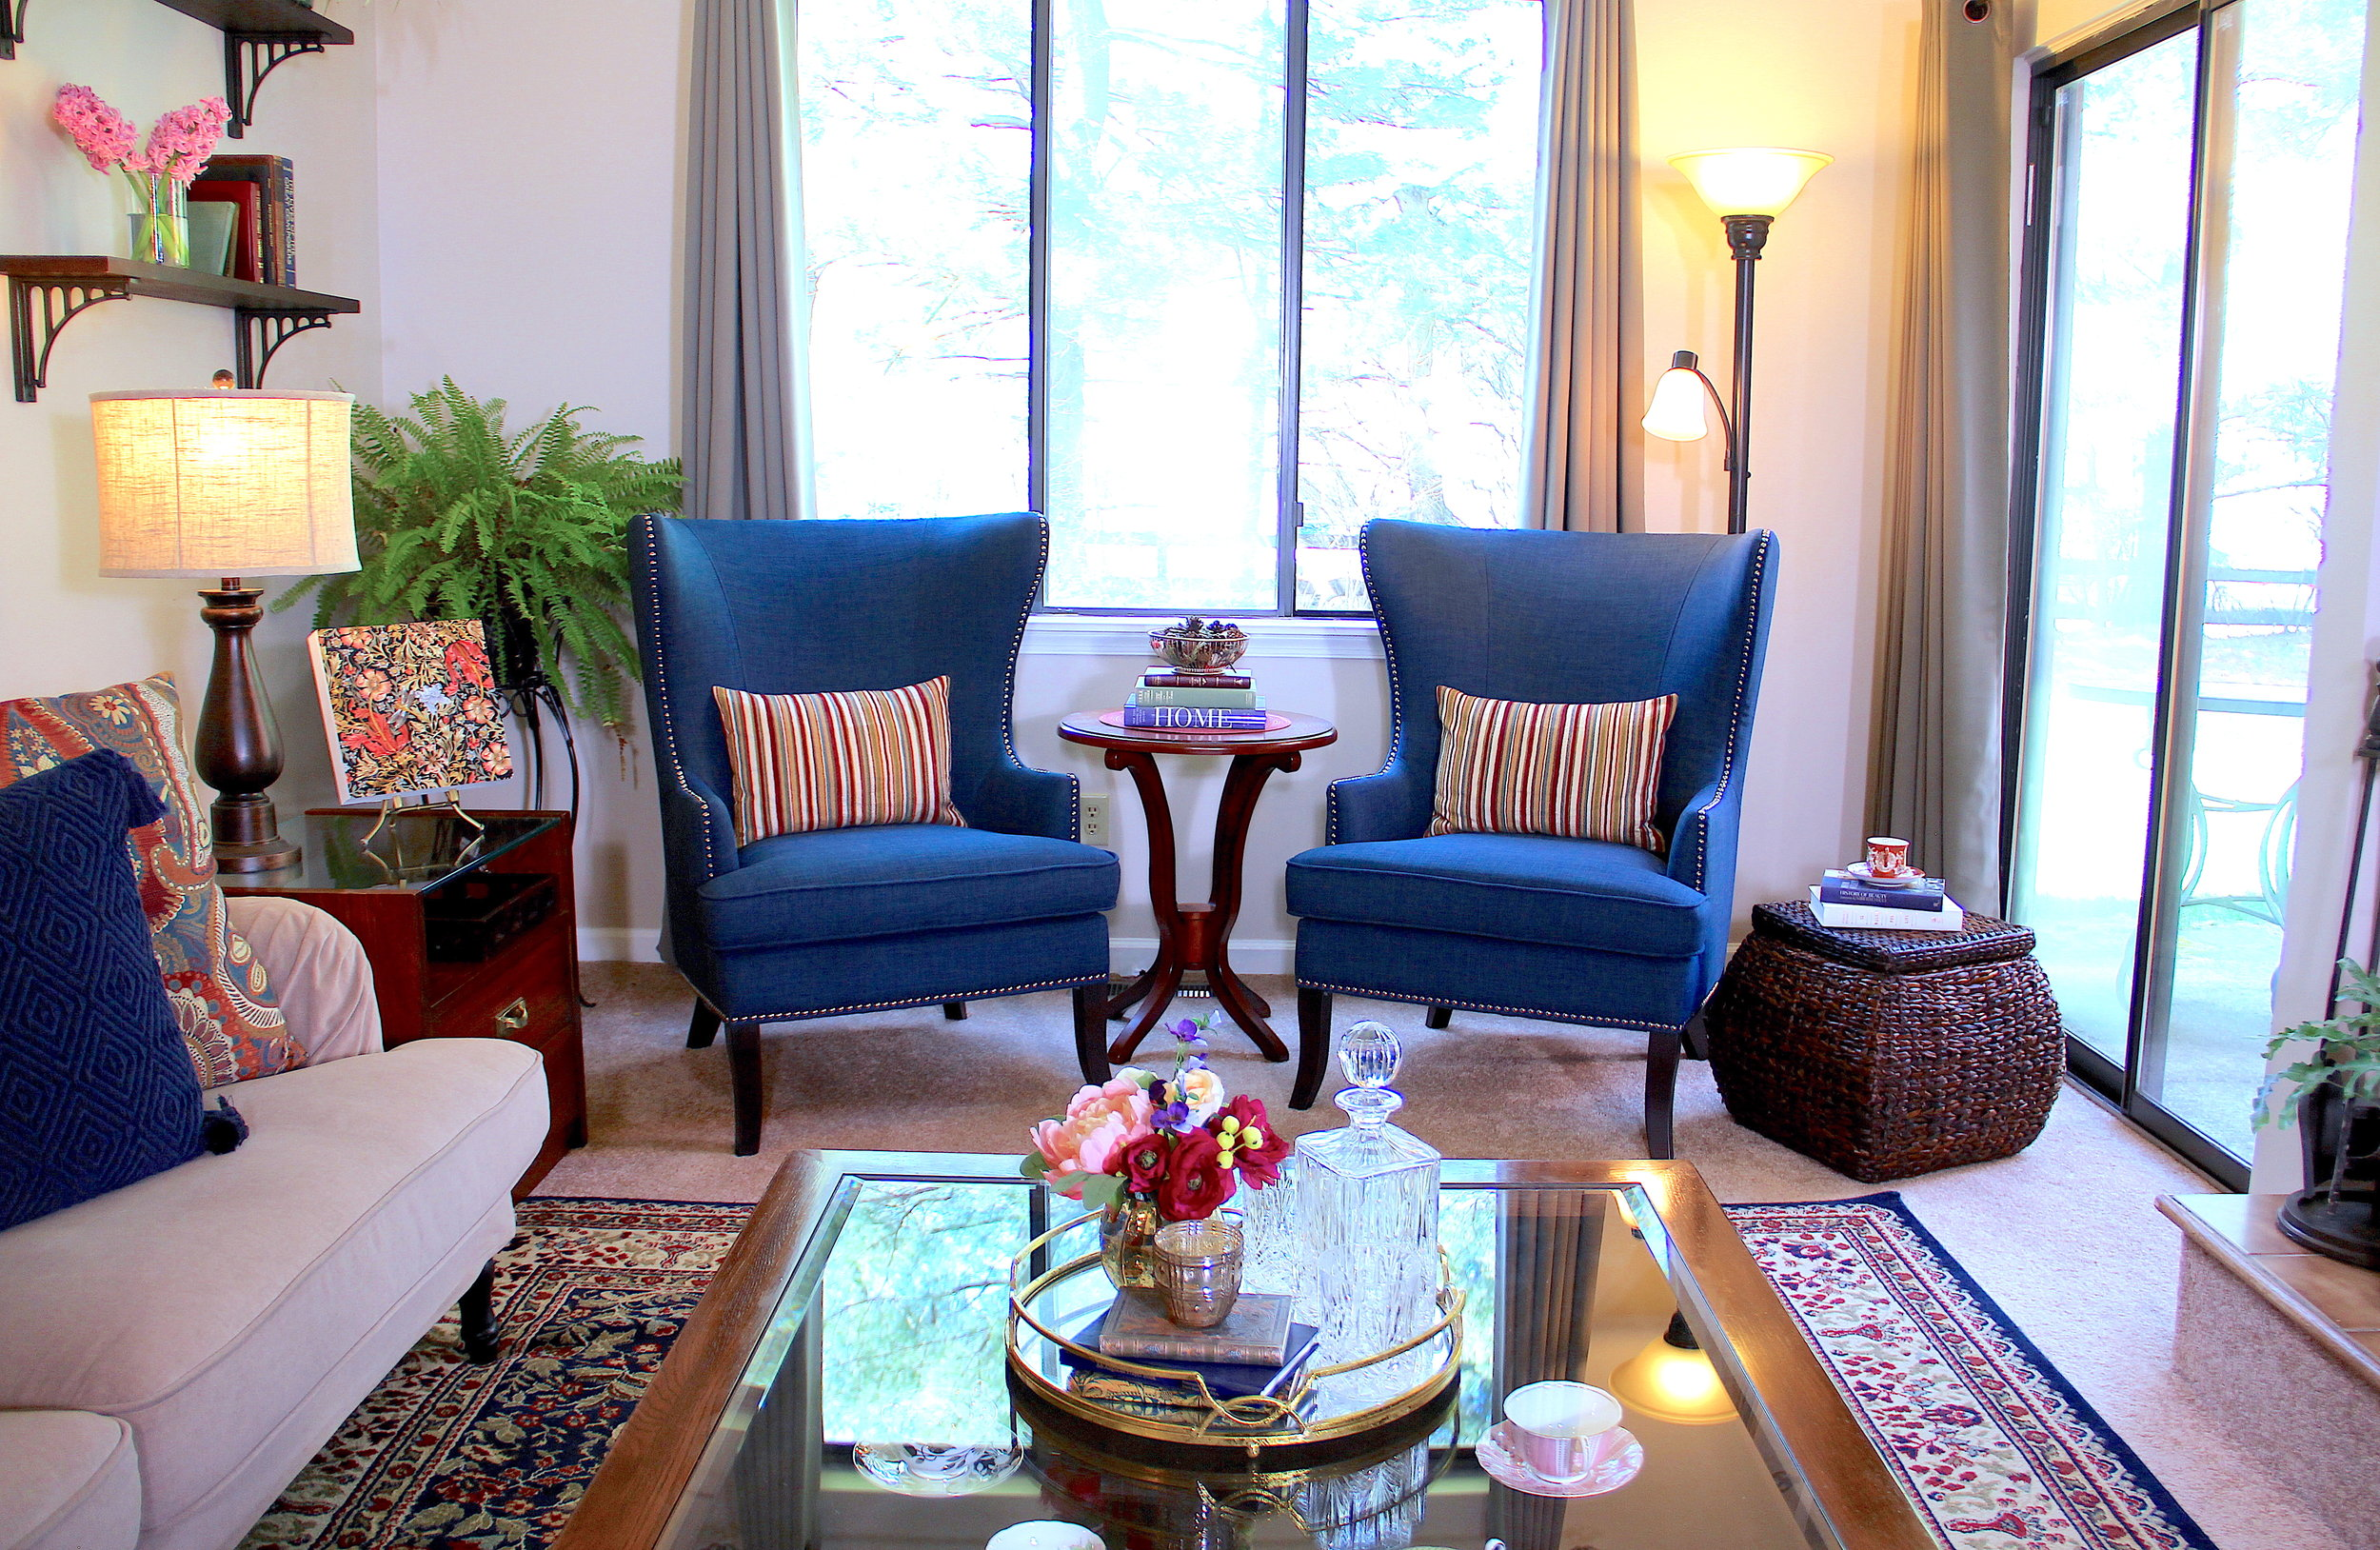 Living Room Aesthetic Interiors